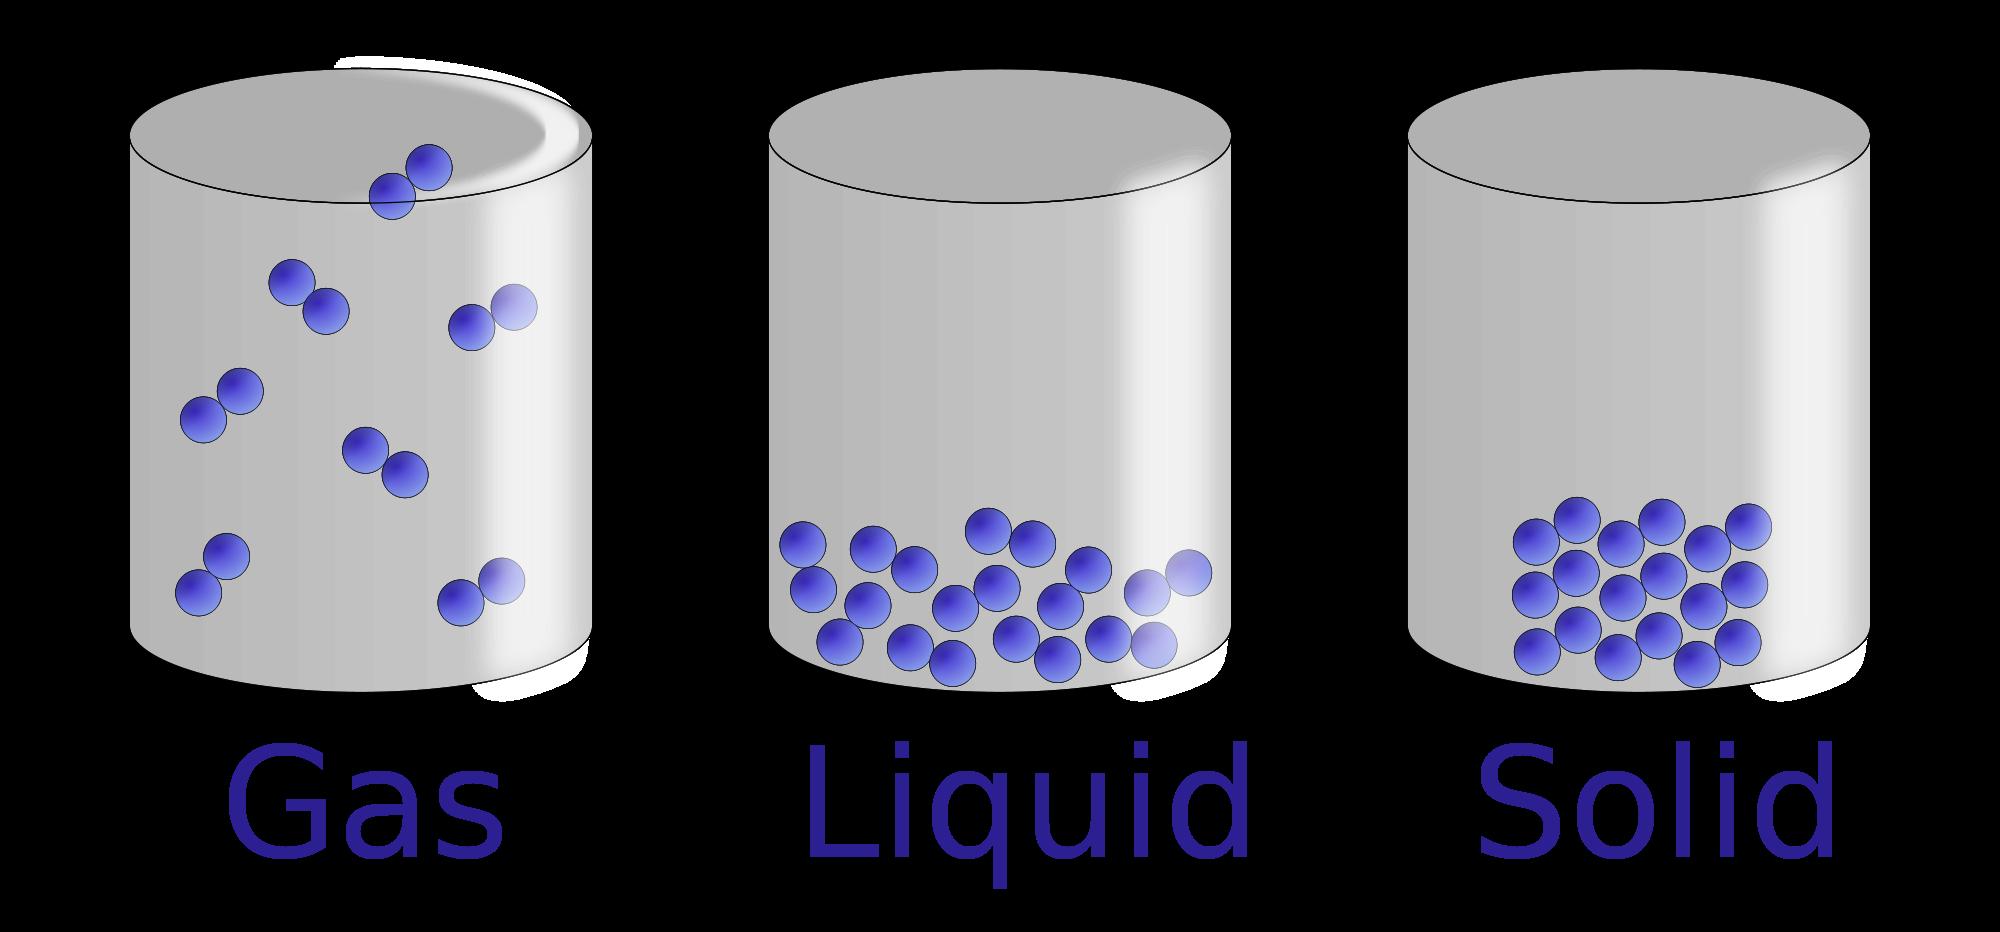 Particle clipart energy Liquids Gases  ebookfinal